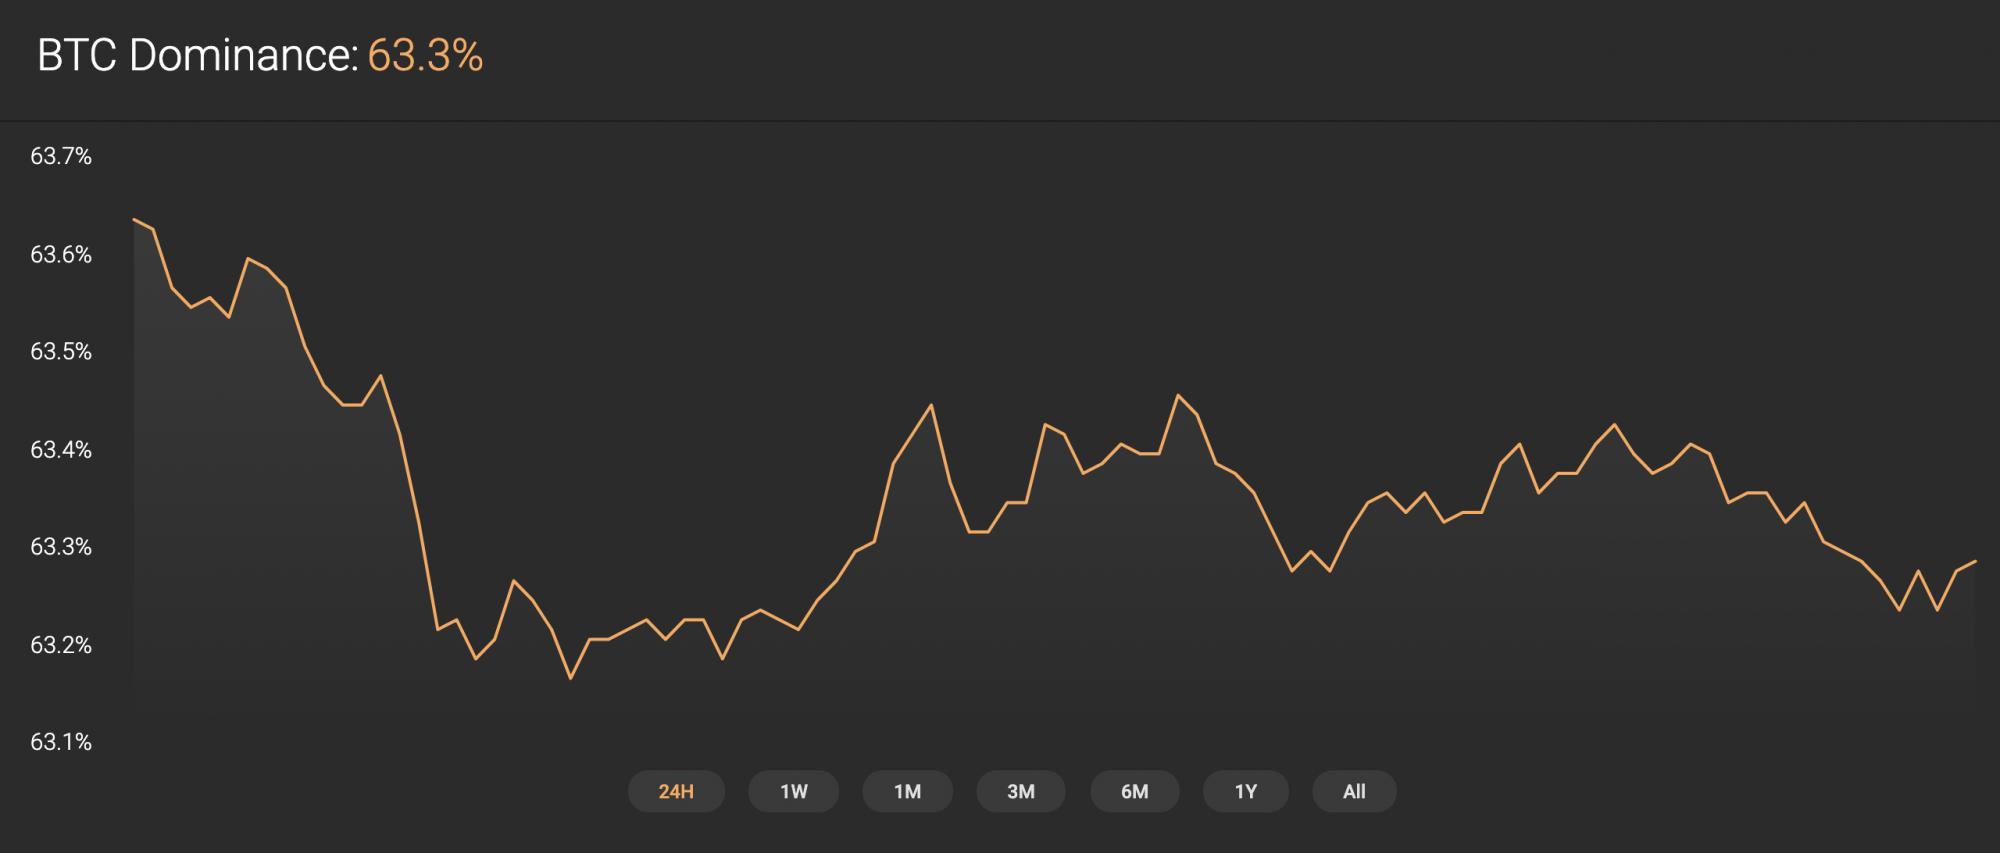 BTC dominance rate